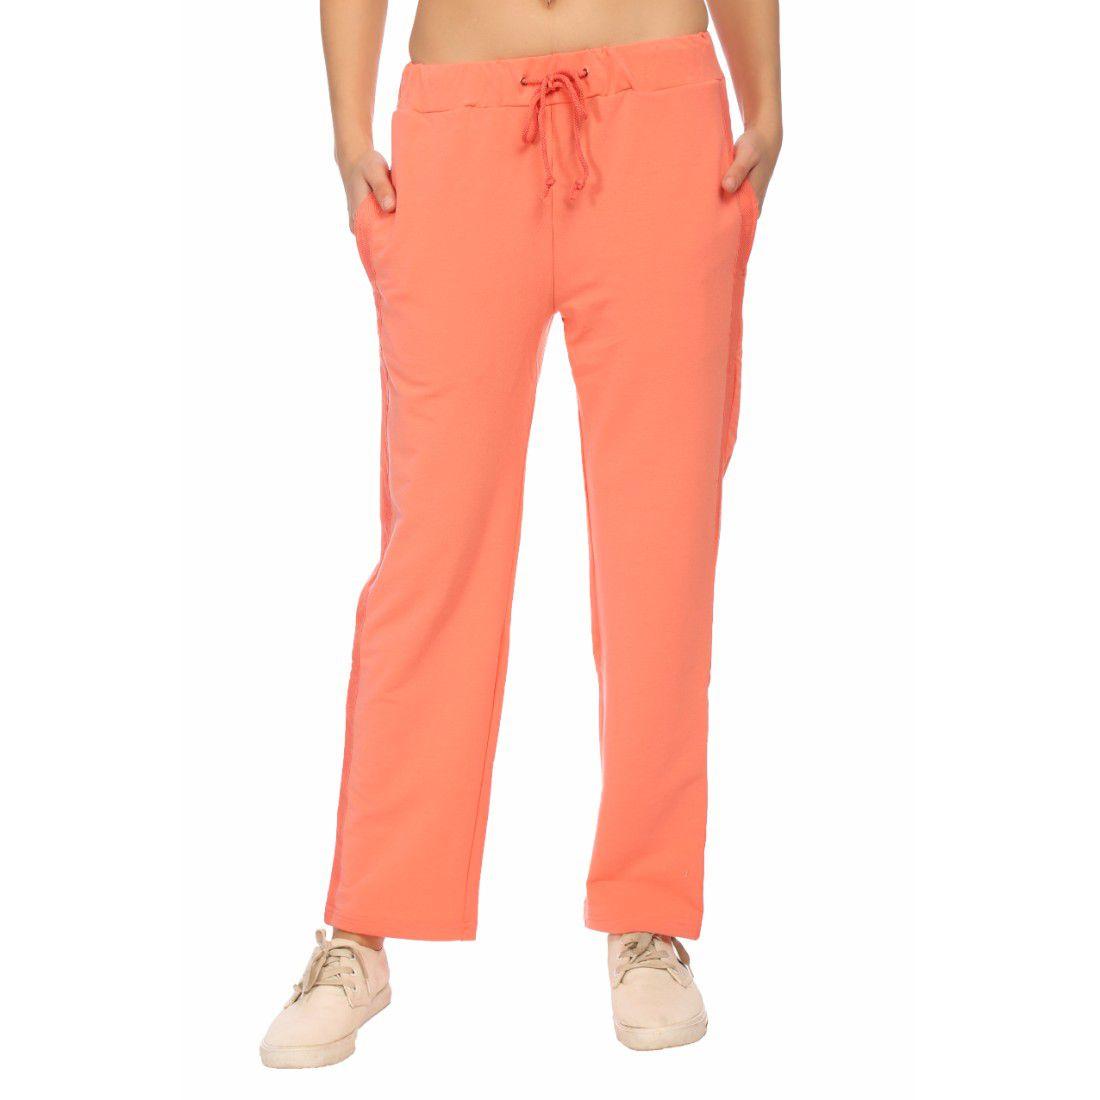 Taaruush Looper Knit Pajamas - Peach